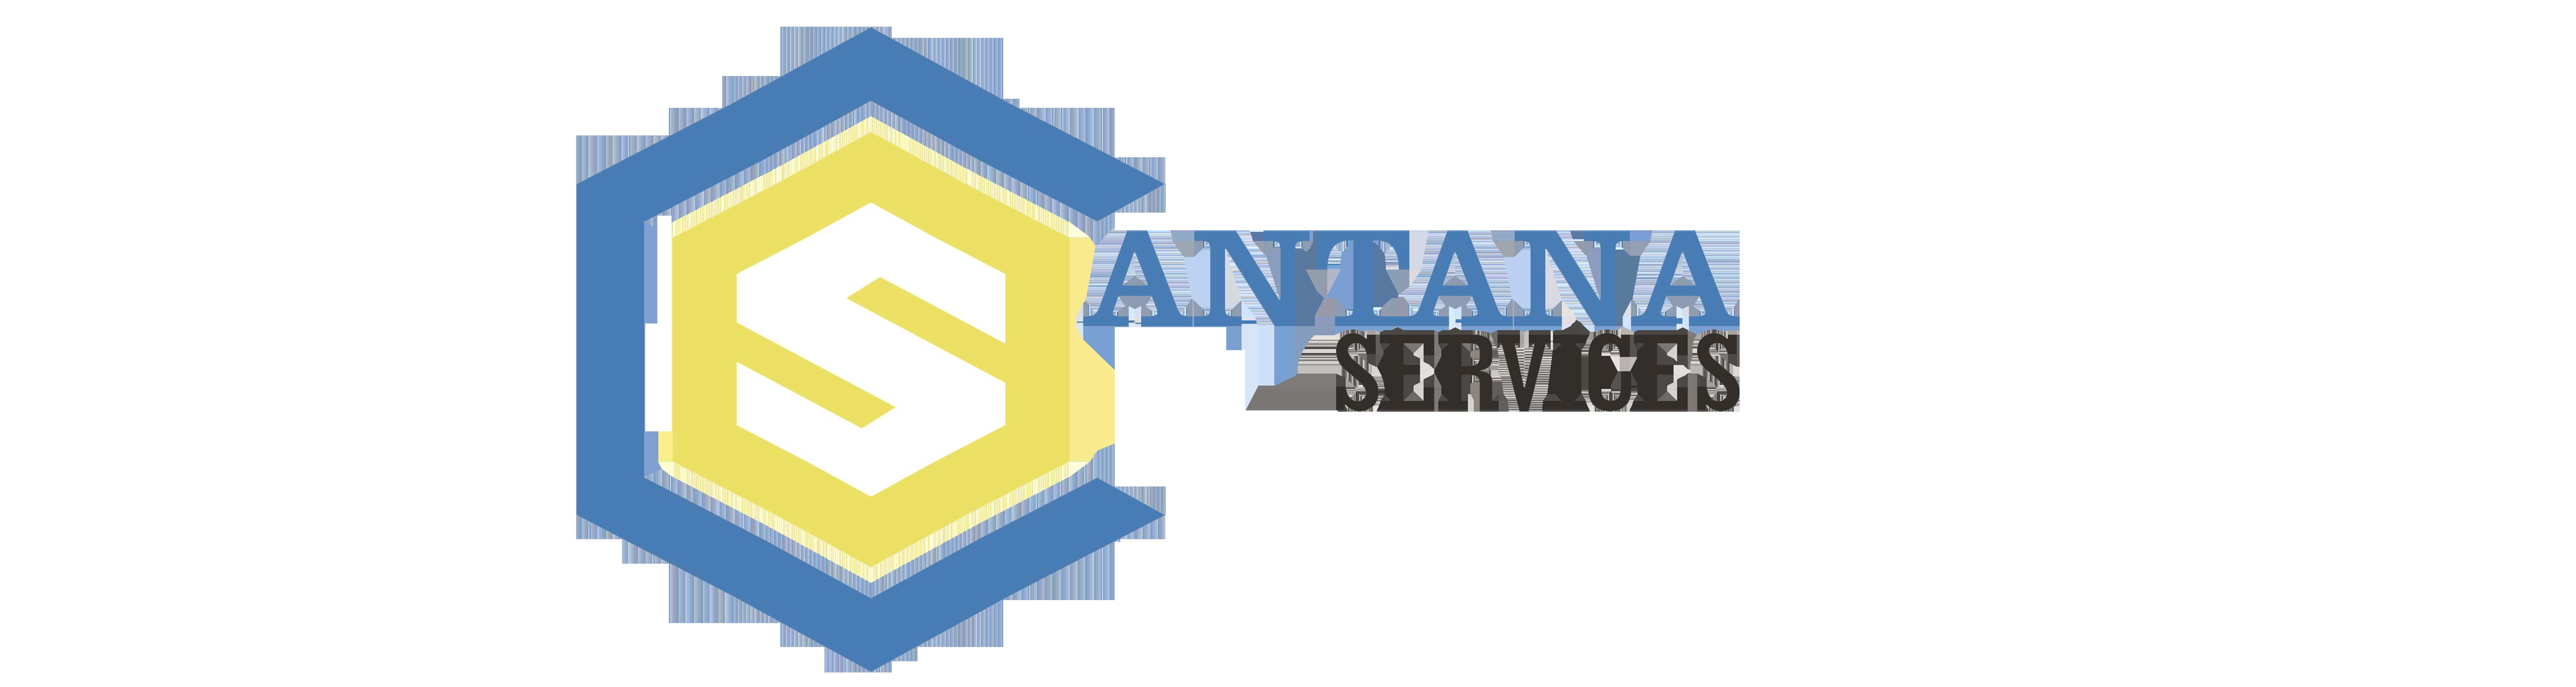 SANTANA SERVICES